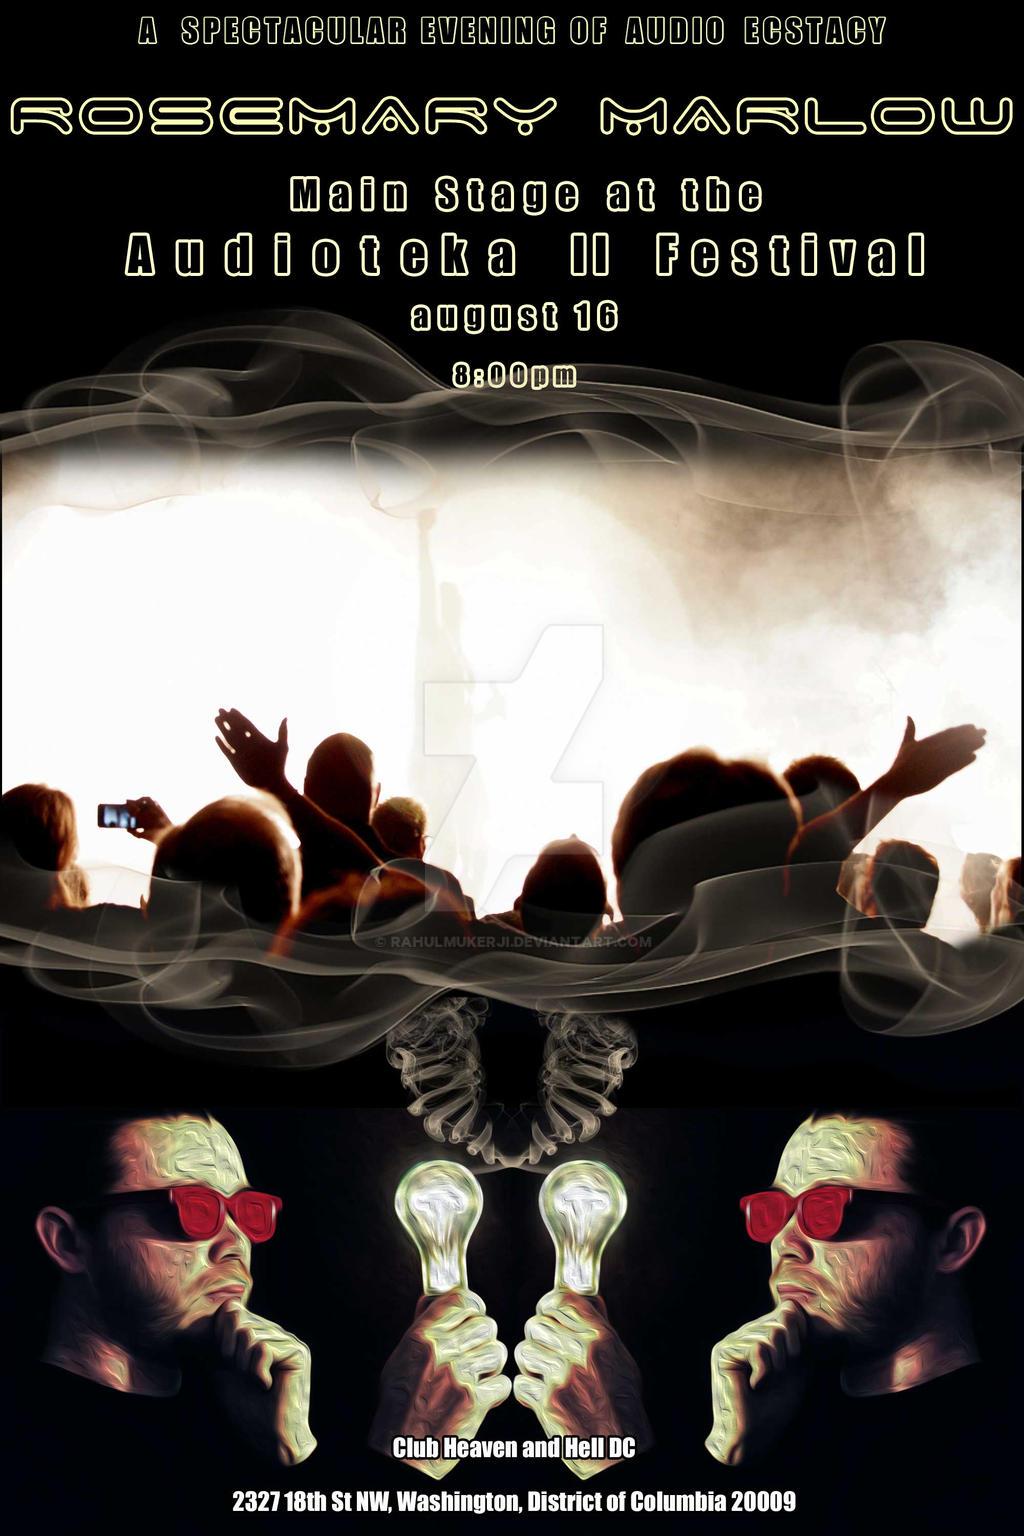 RMM Poster IV